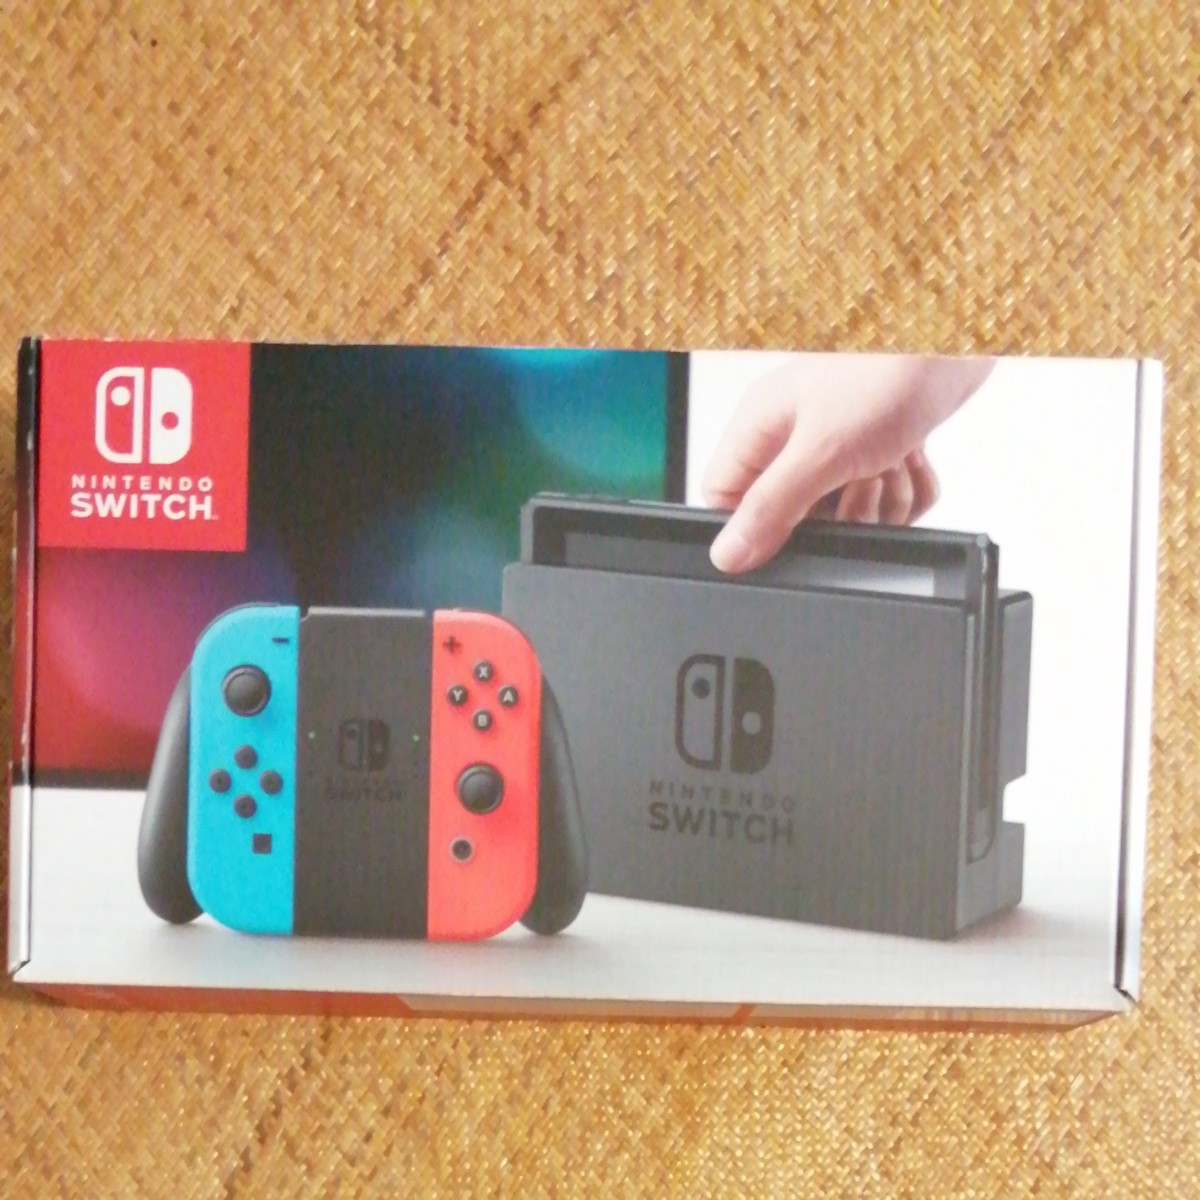 Nintendo Switch Joy-Con (L)   ネオンブルー  ネオンレッド (R)